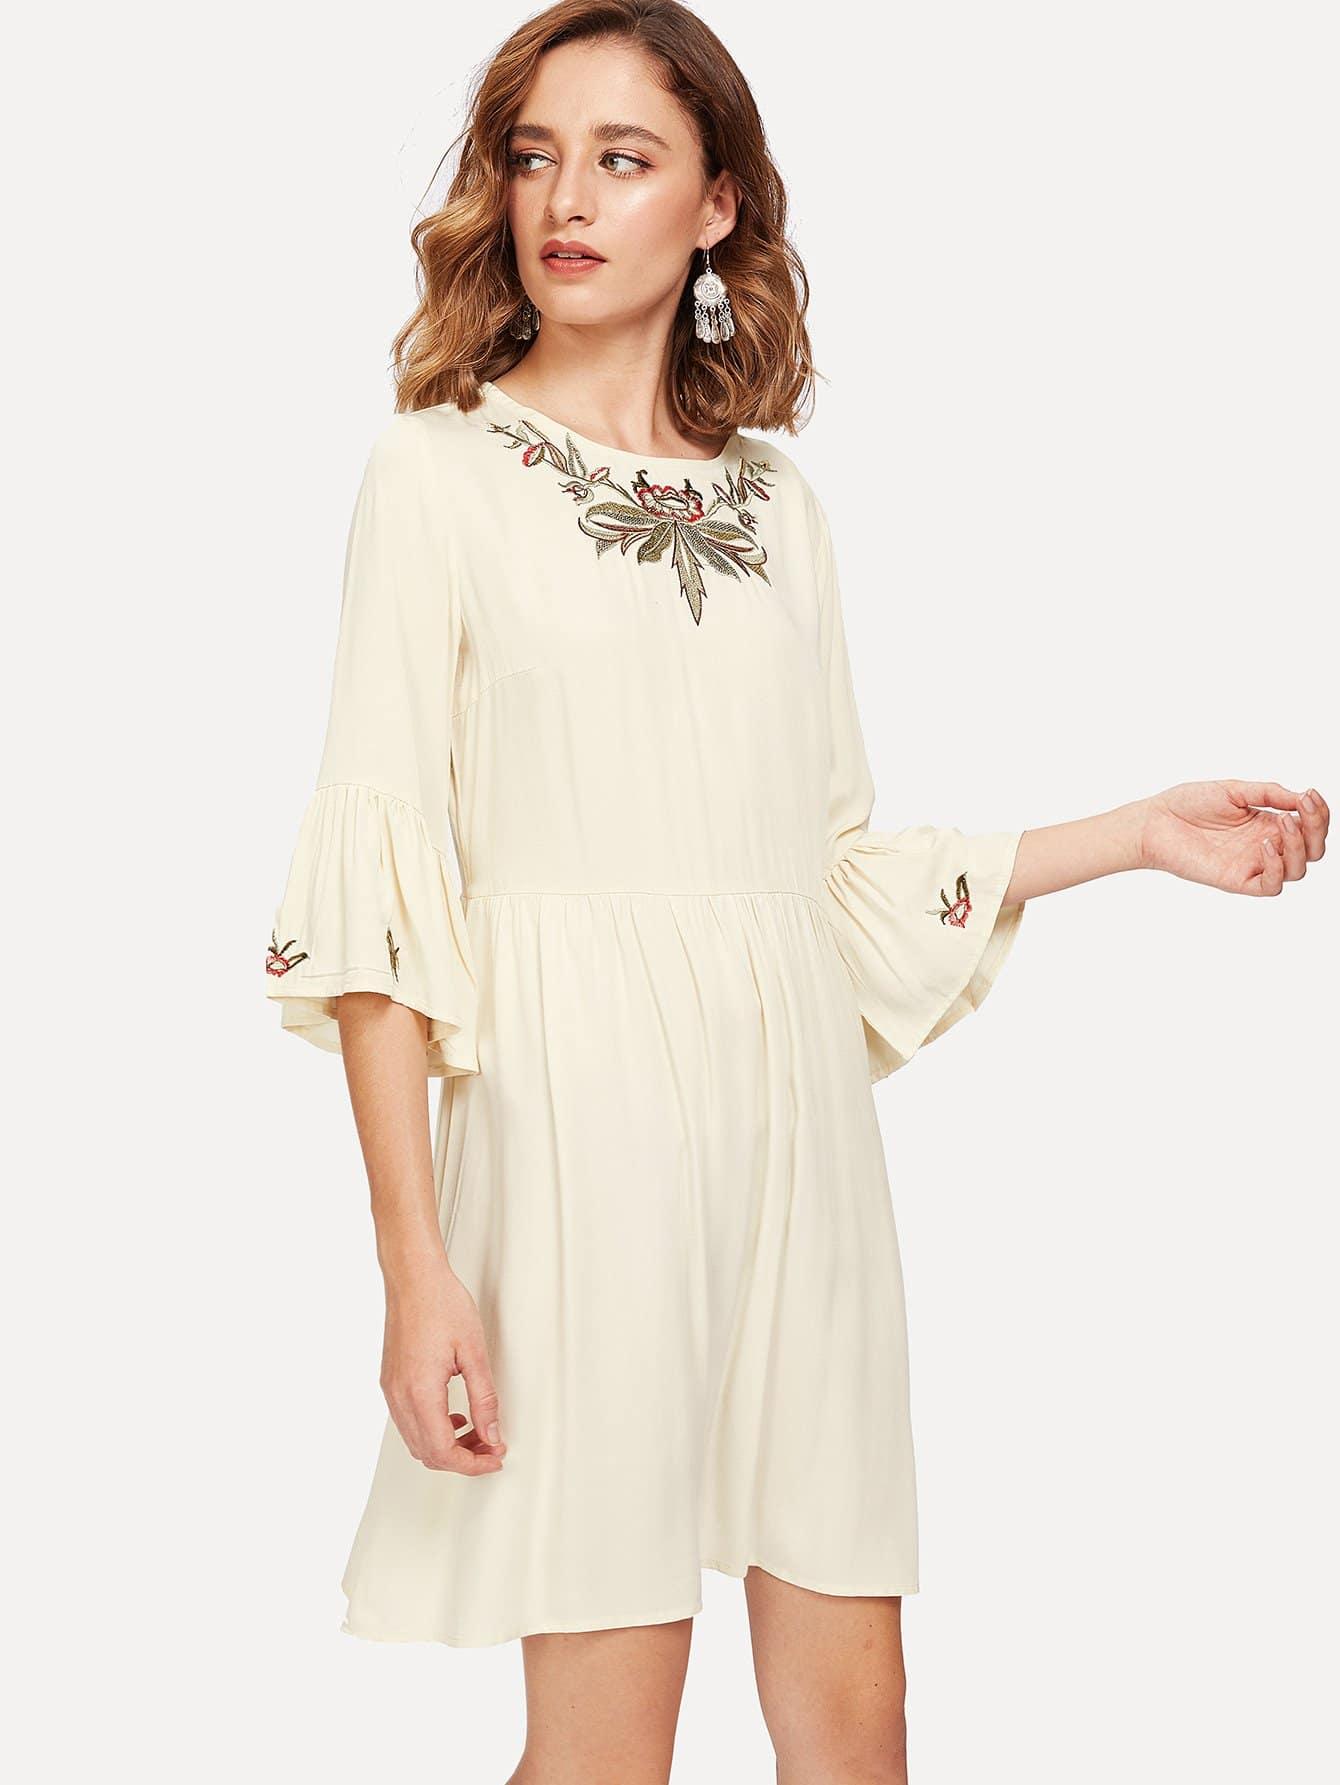 Flounce Sleeve Embroidery Smock Dress flounce sleeve eyelet embroidery dress